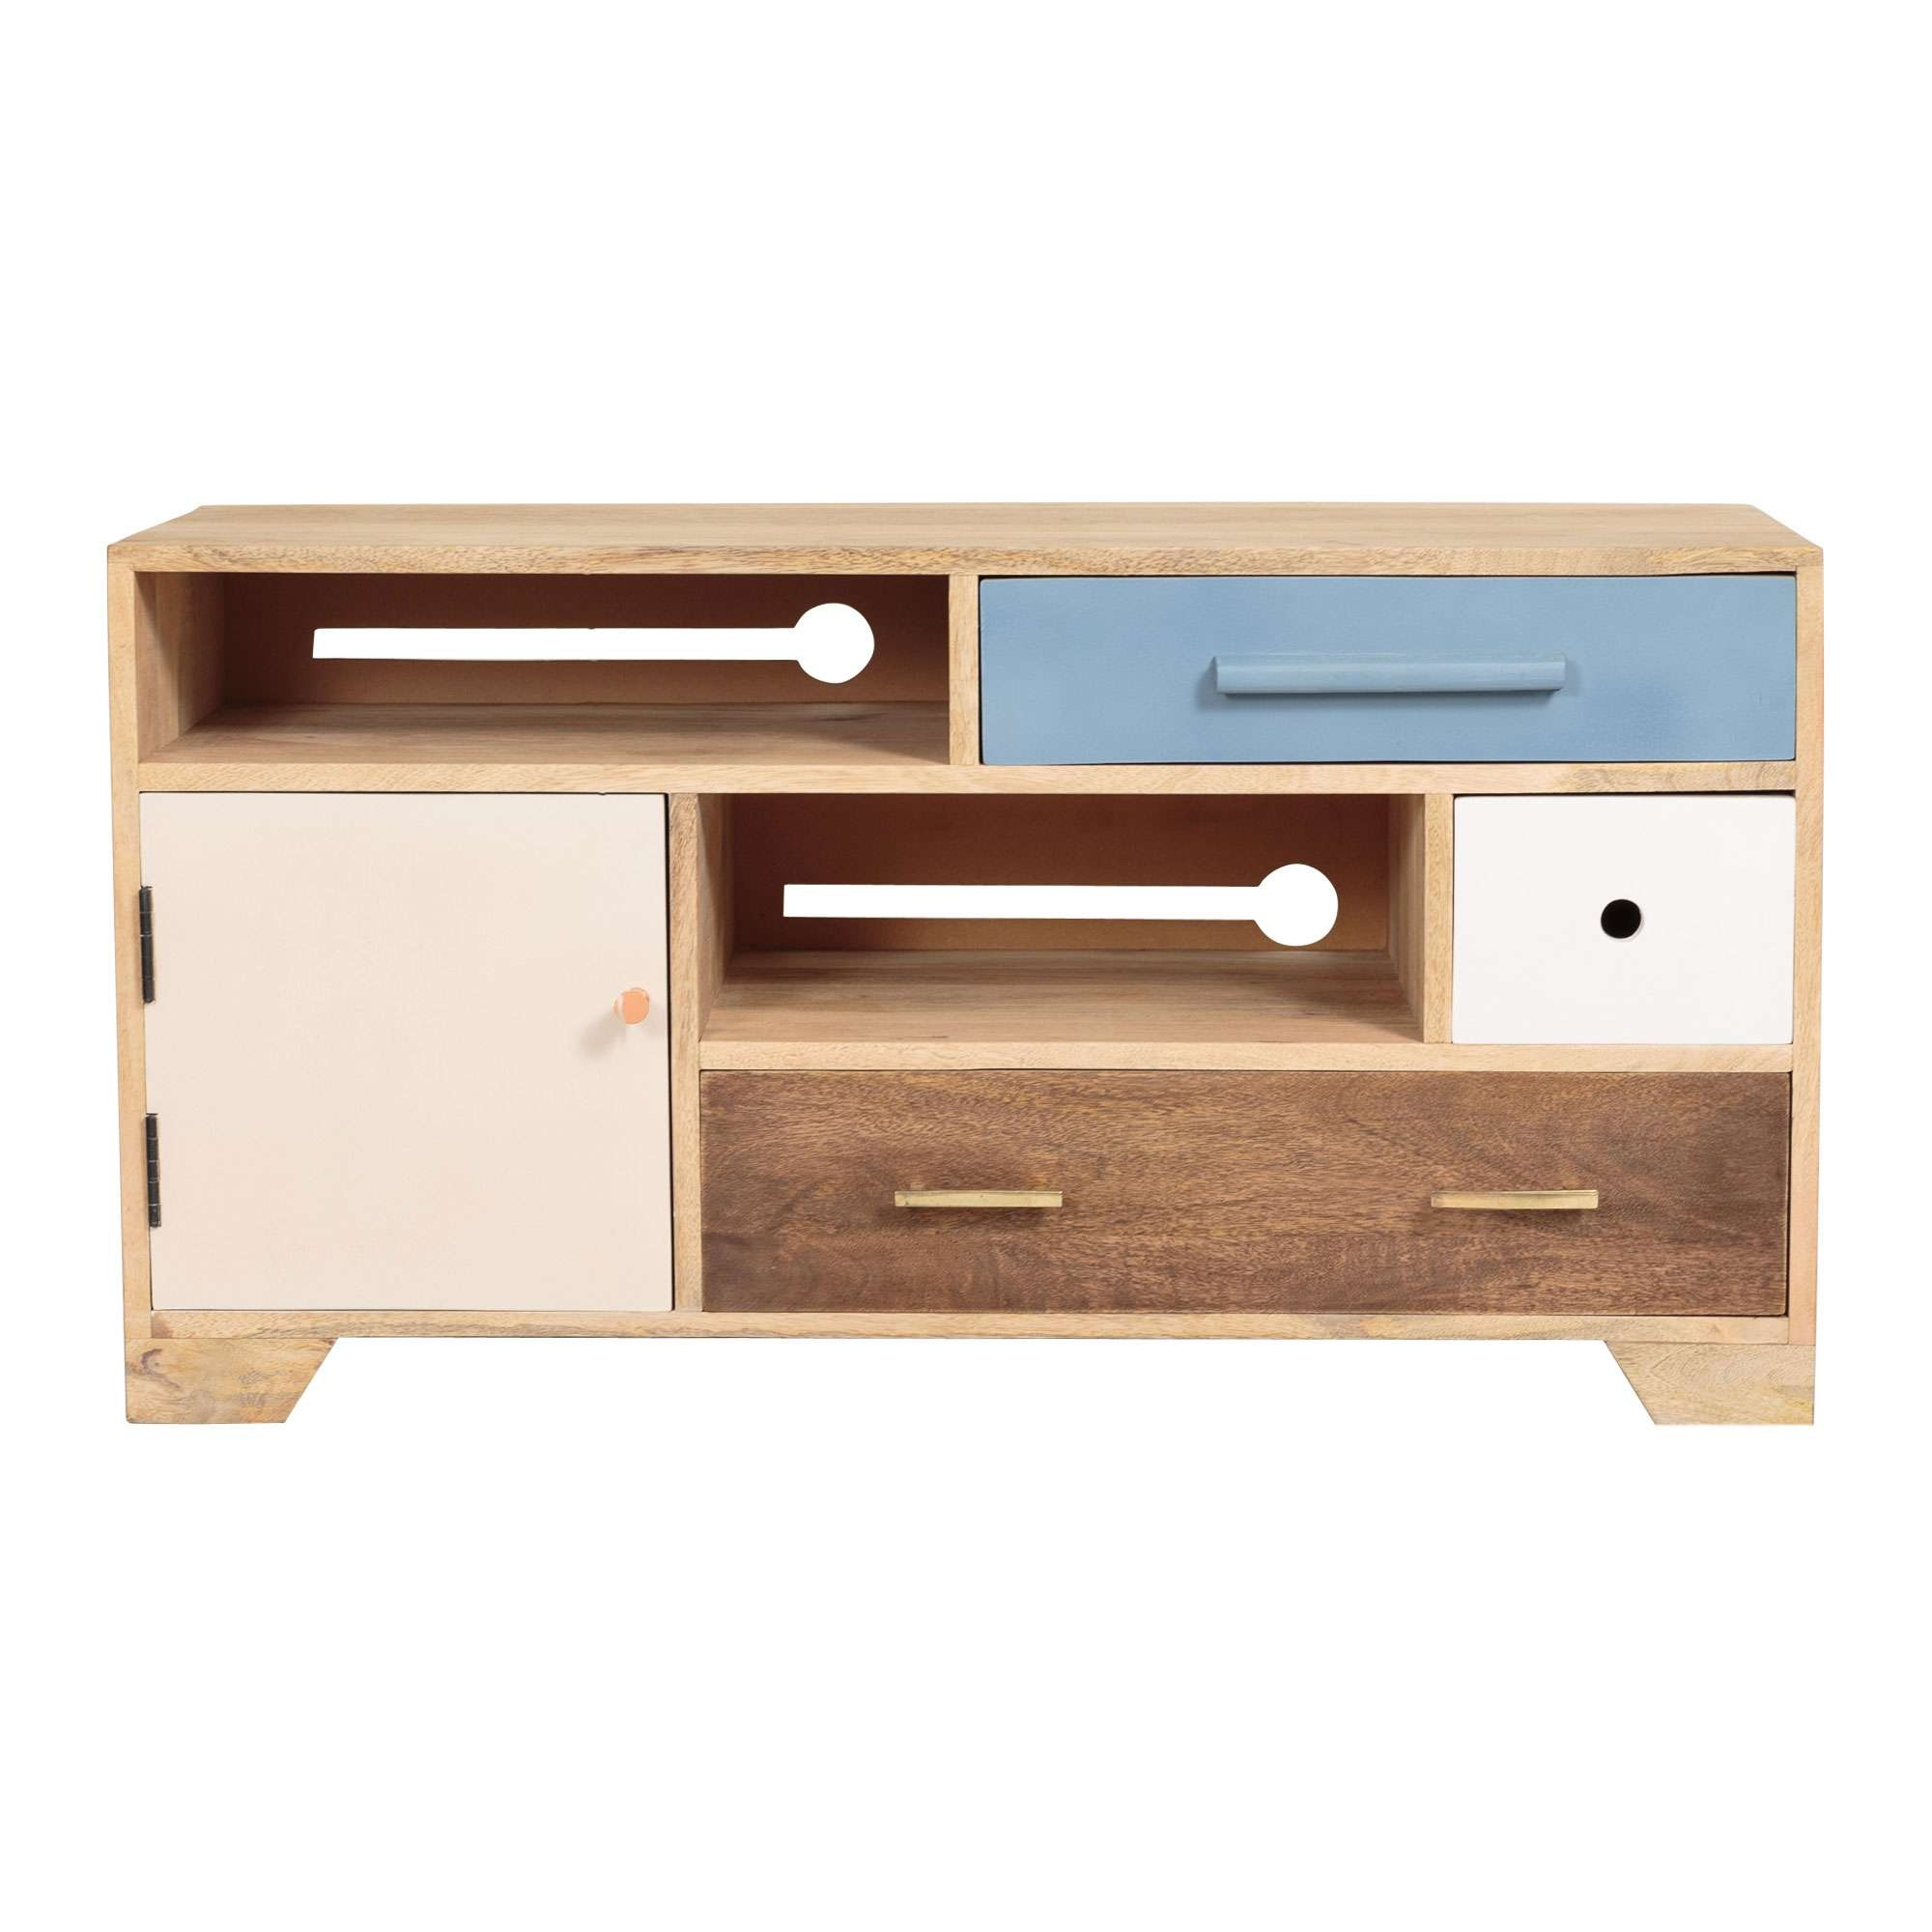 Jennifer Wooden Tv Cabinet | Oliver Bonas Inside Mango Wood Tv Cabinets (View 11 of 20)